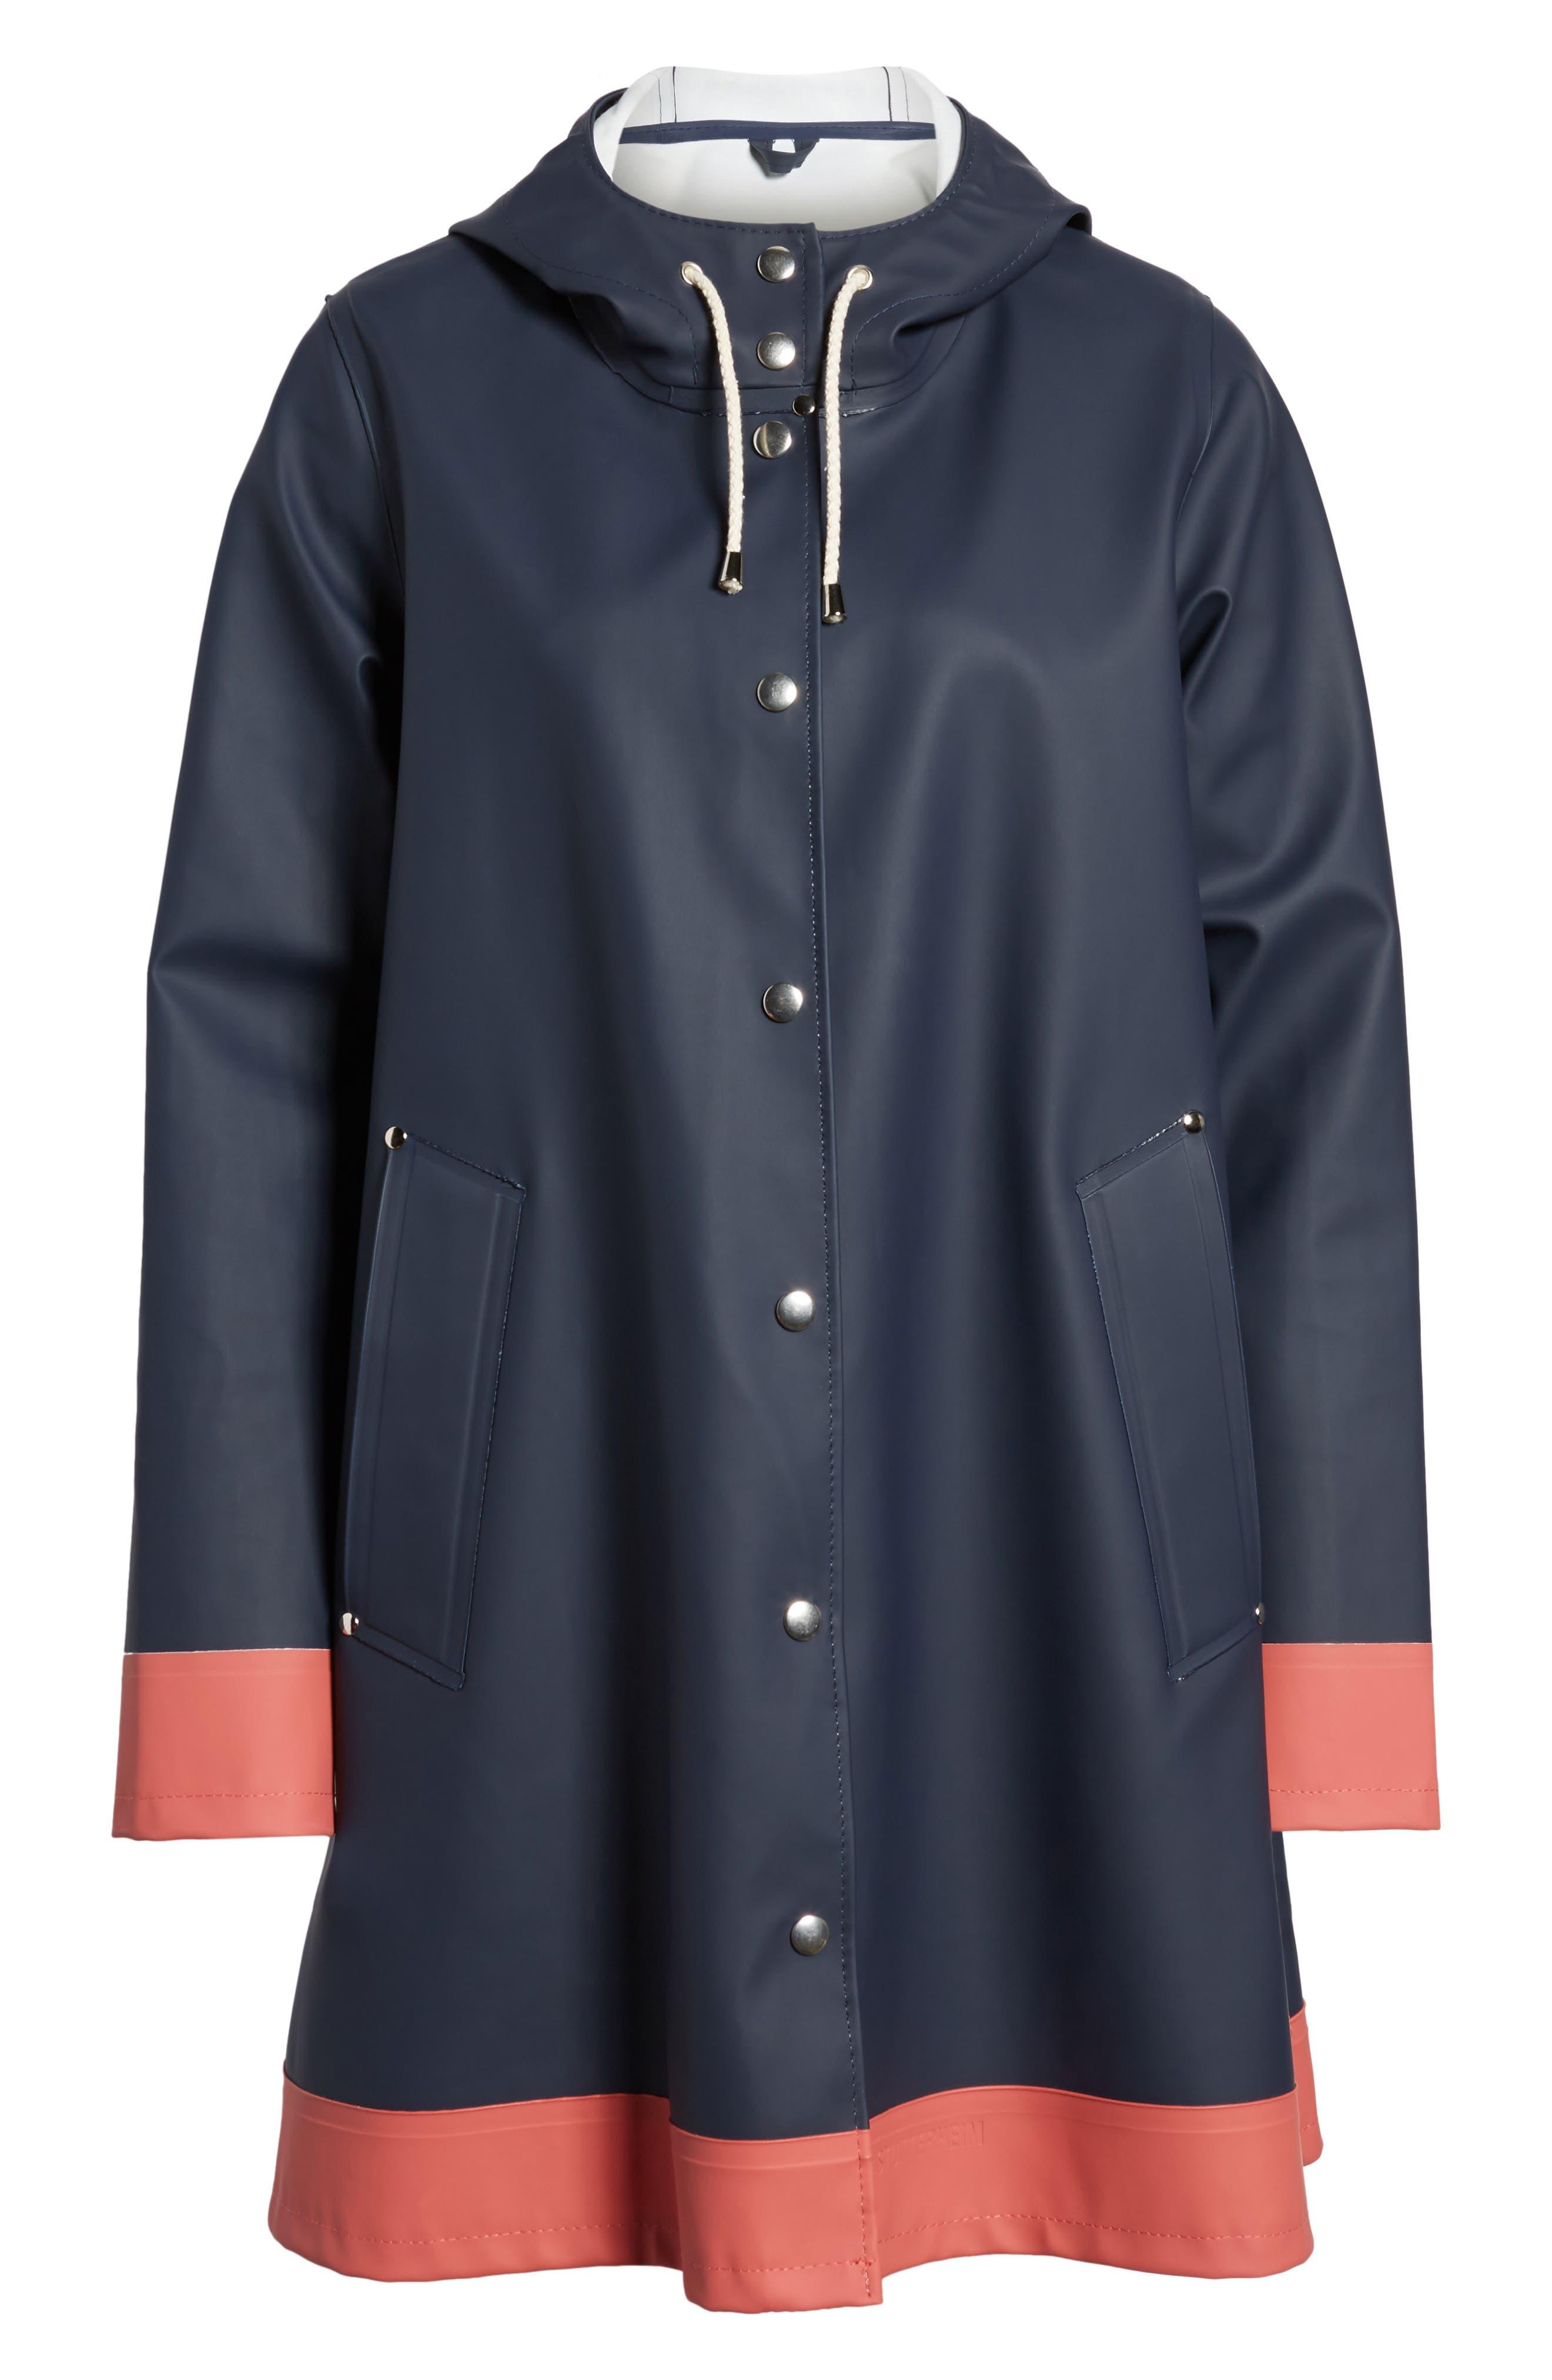 Mosebacke Frame Colorblock Raincoat,                             Alternate thumbnail 6, color,                             Navy/ Faded Rose